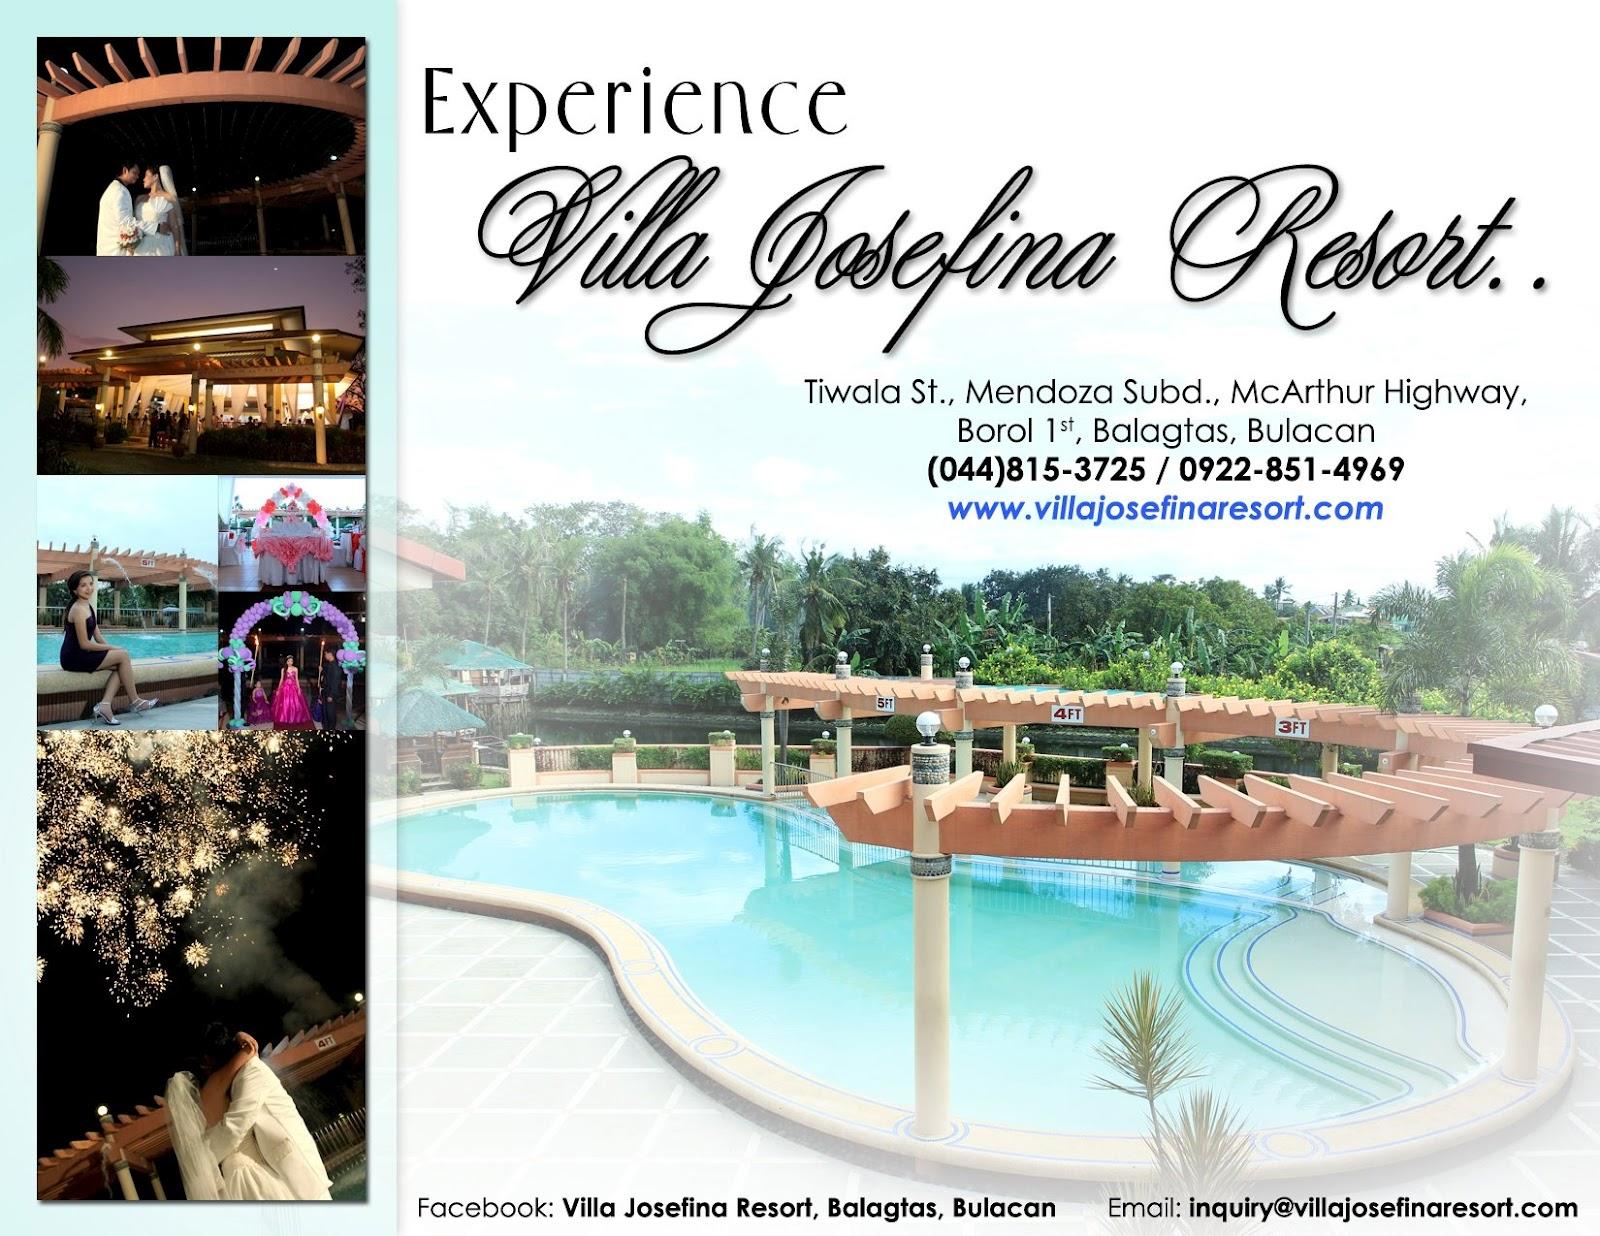 Balagtas Resort Formerly Villa Christina